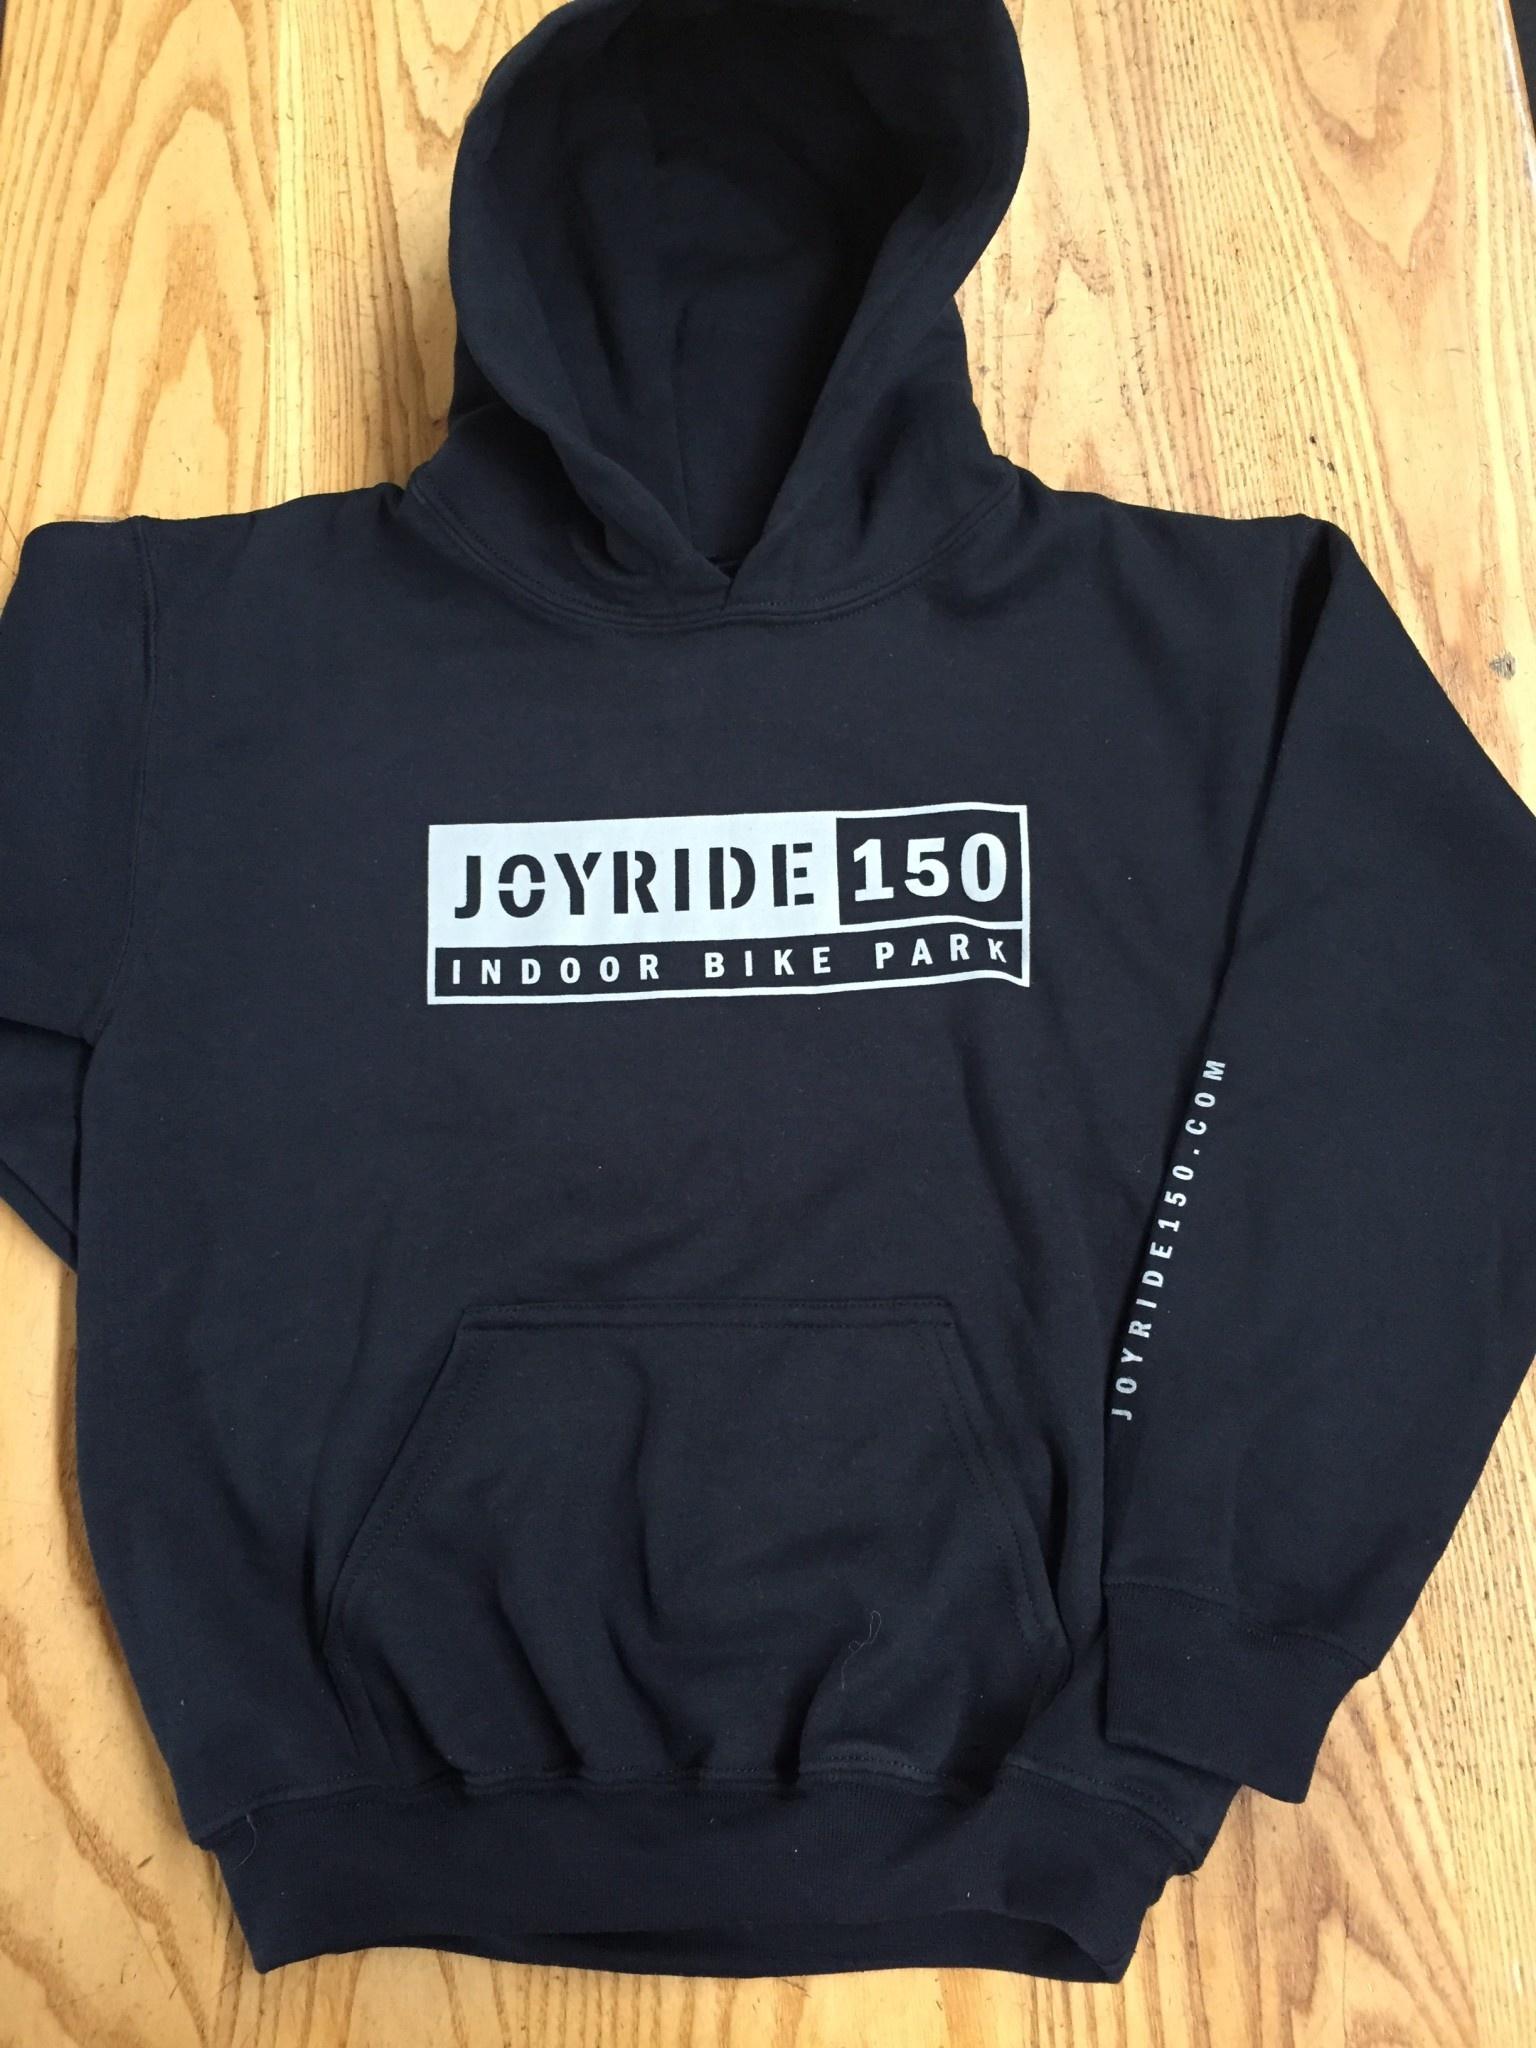 Joyride 150 Heavyweight Hoodie